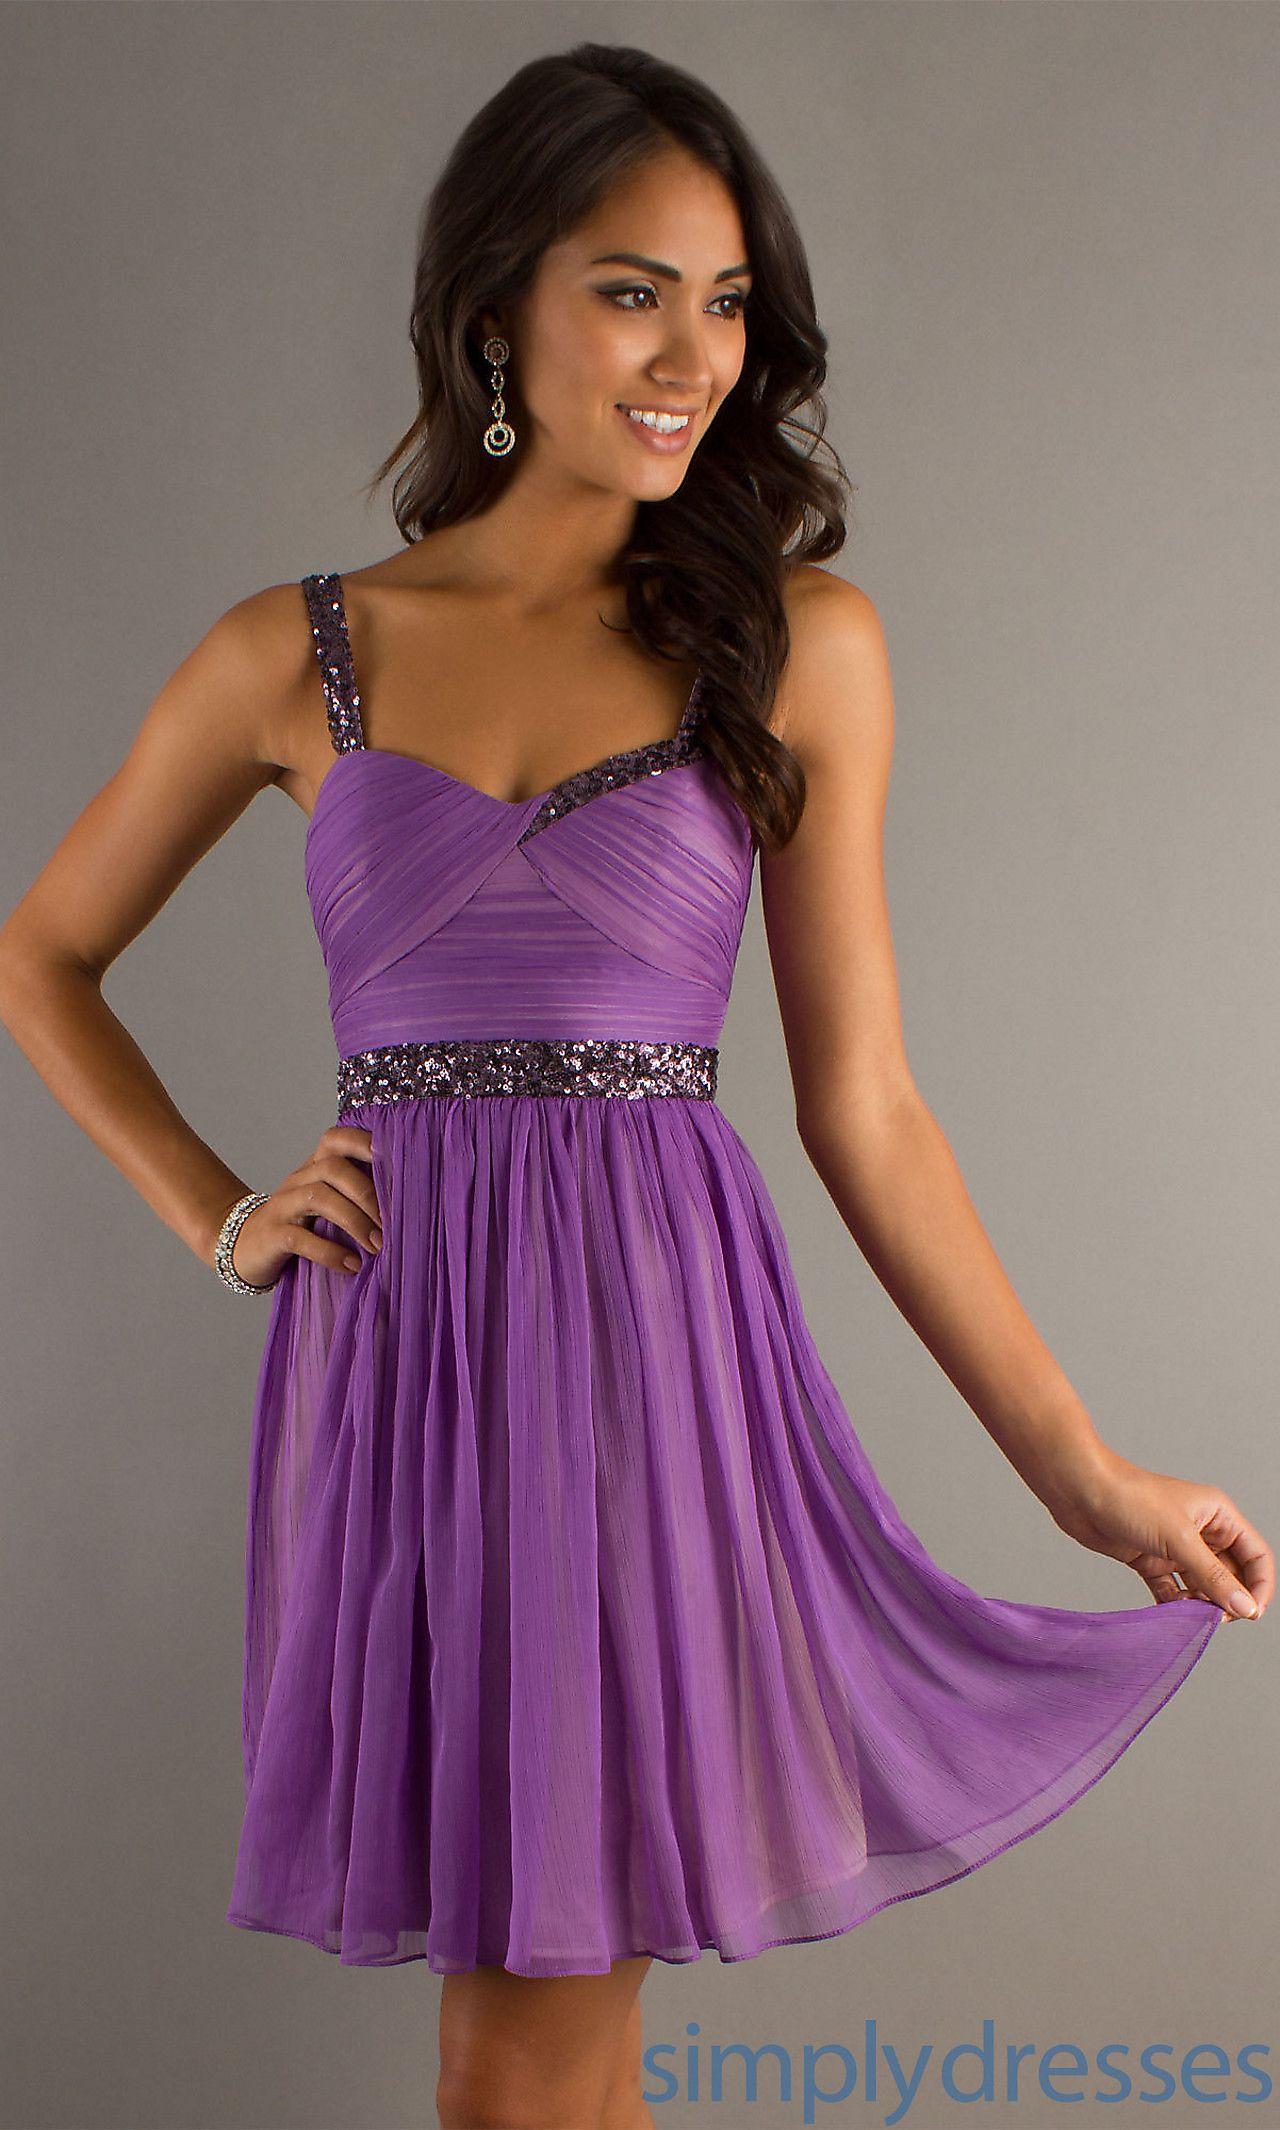 Purple Short Semi-Formal Dress MT-MD-5638 | Cute! | Pinterest